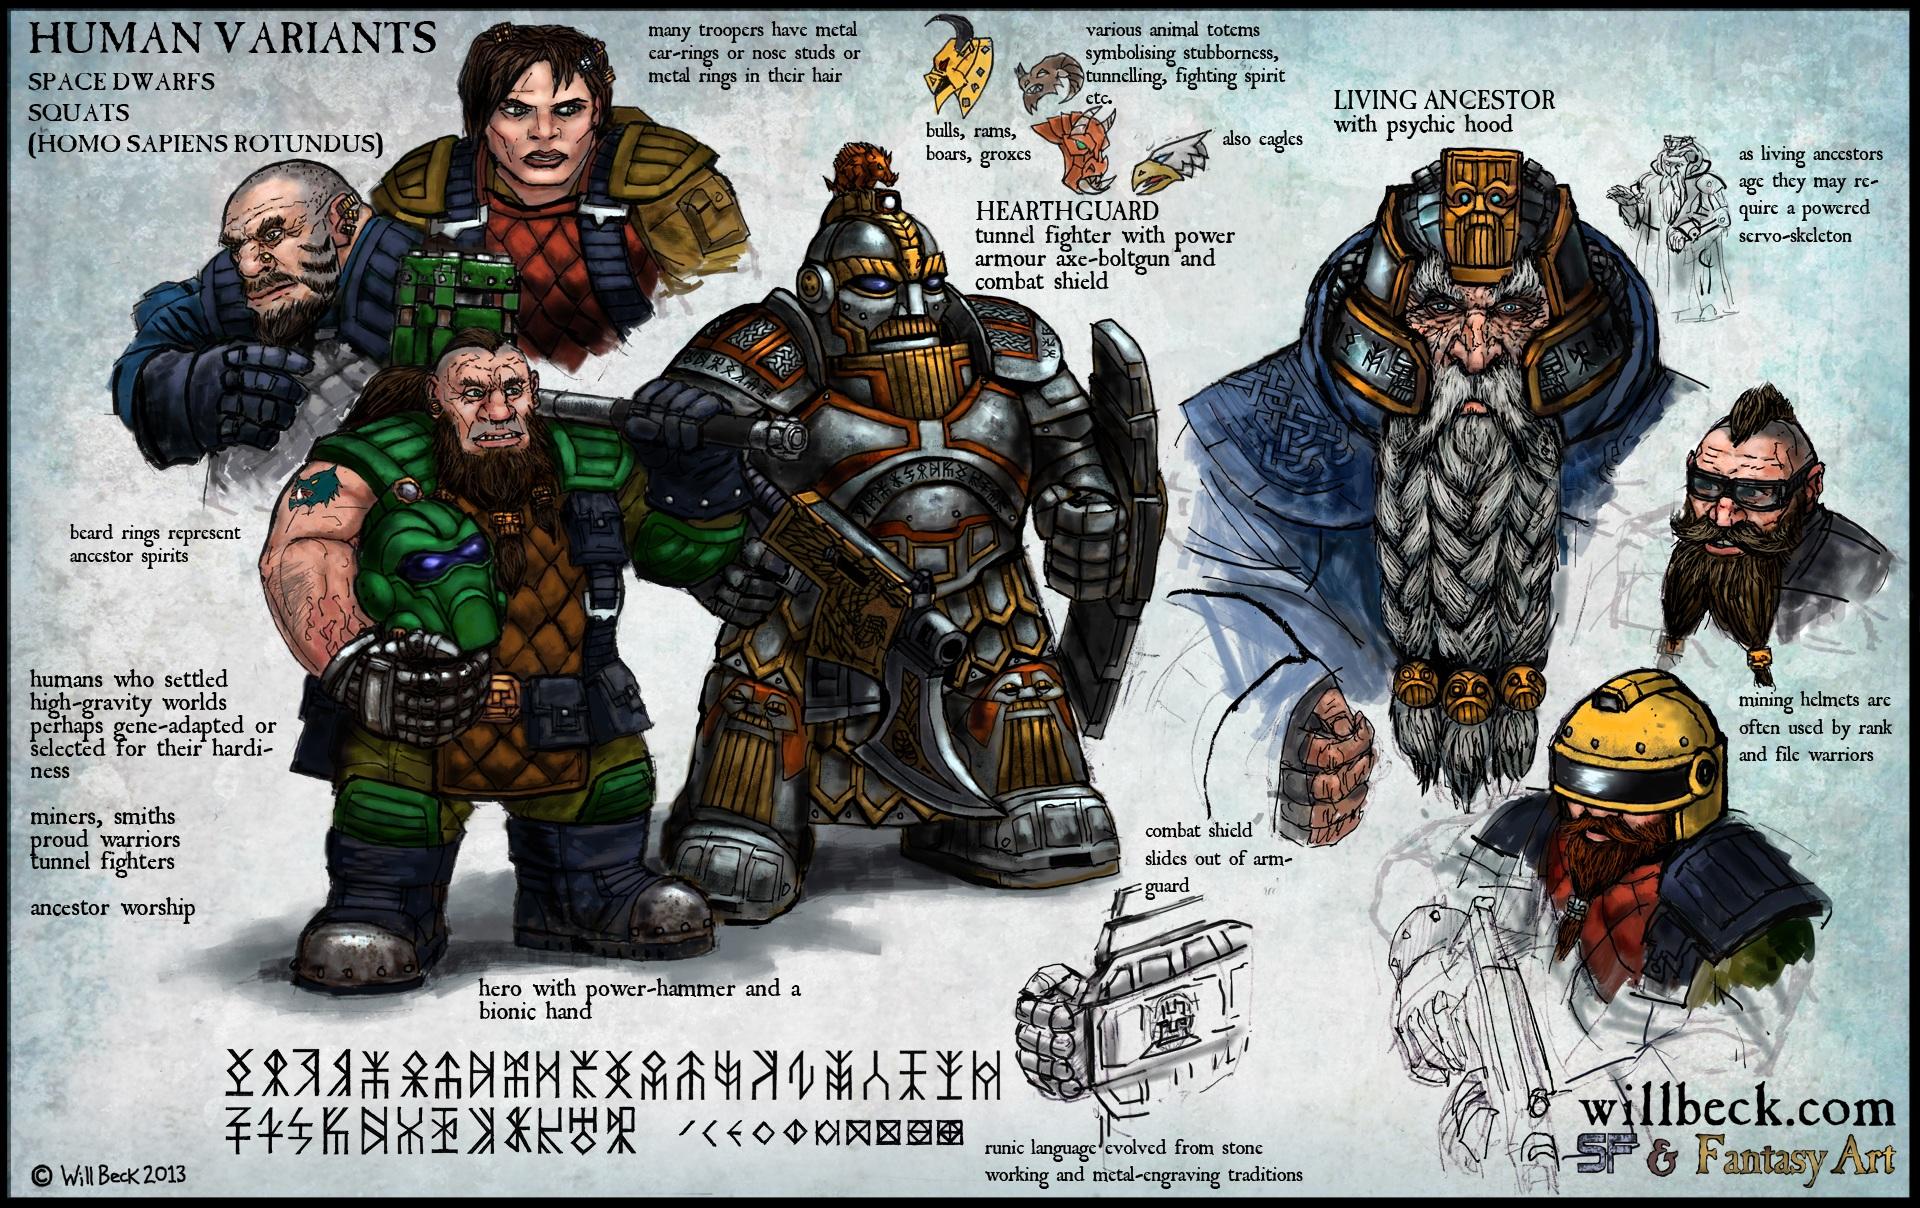 Human variant or 'morph' - Space Dwarf